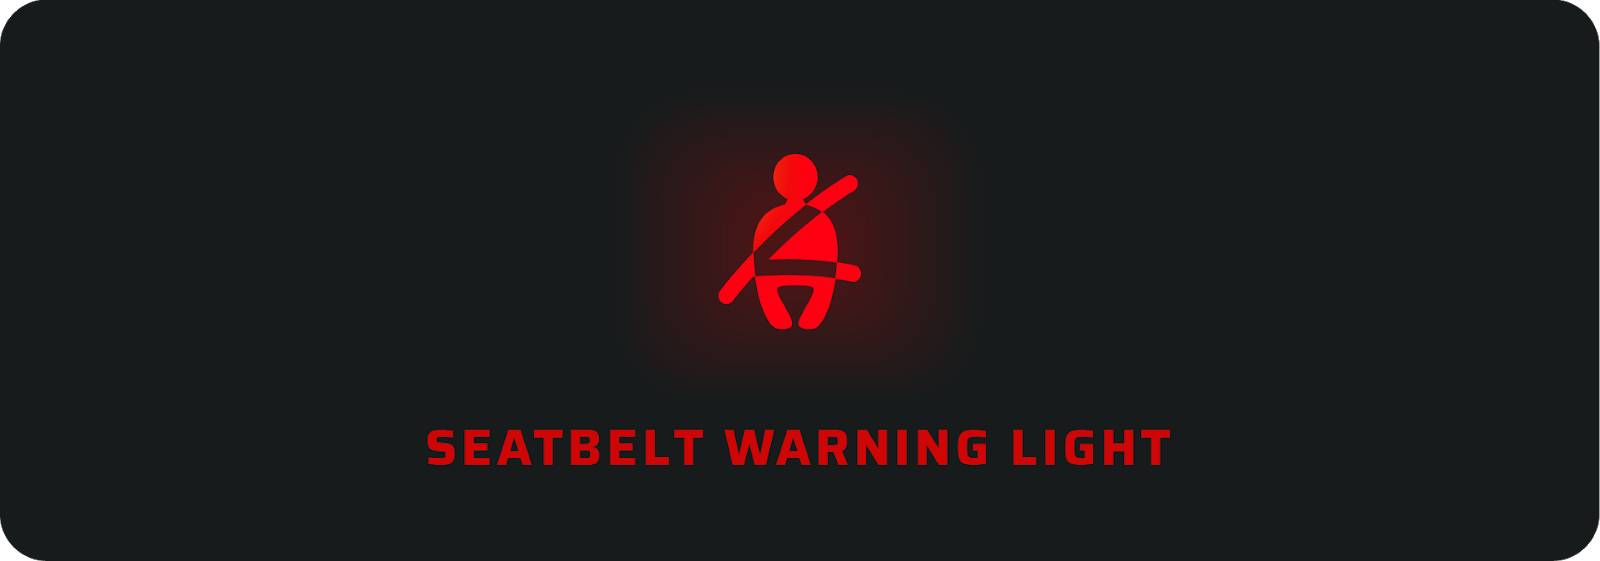 Seatbelt car warning light